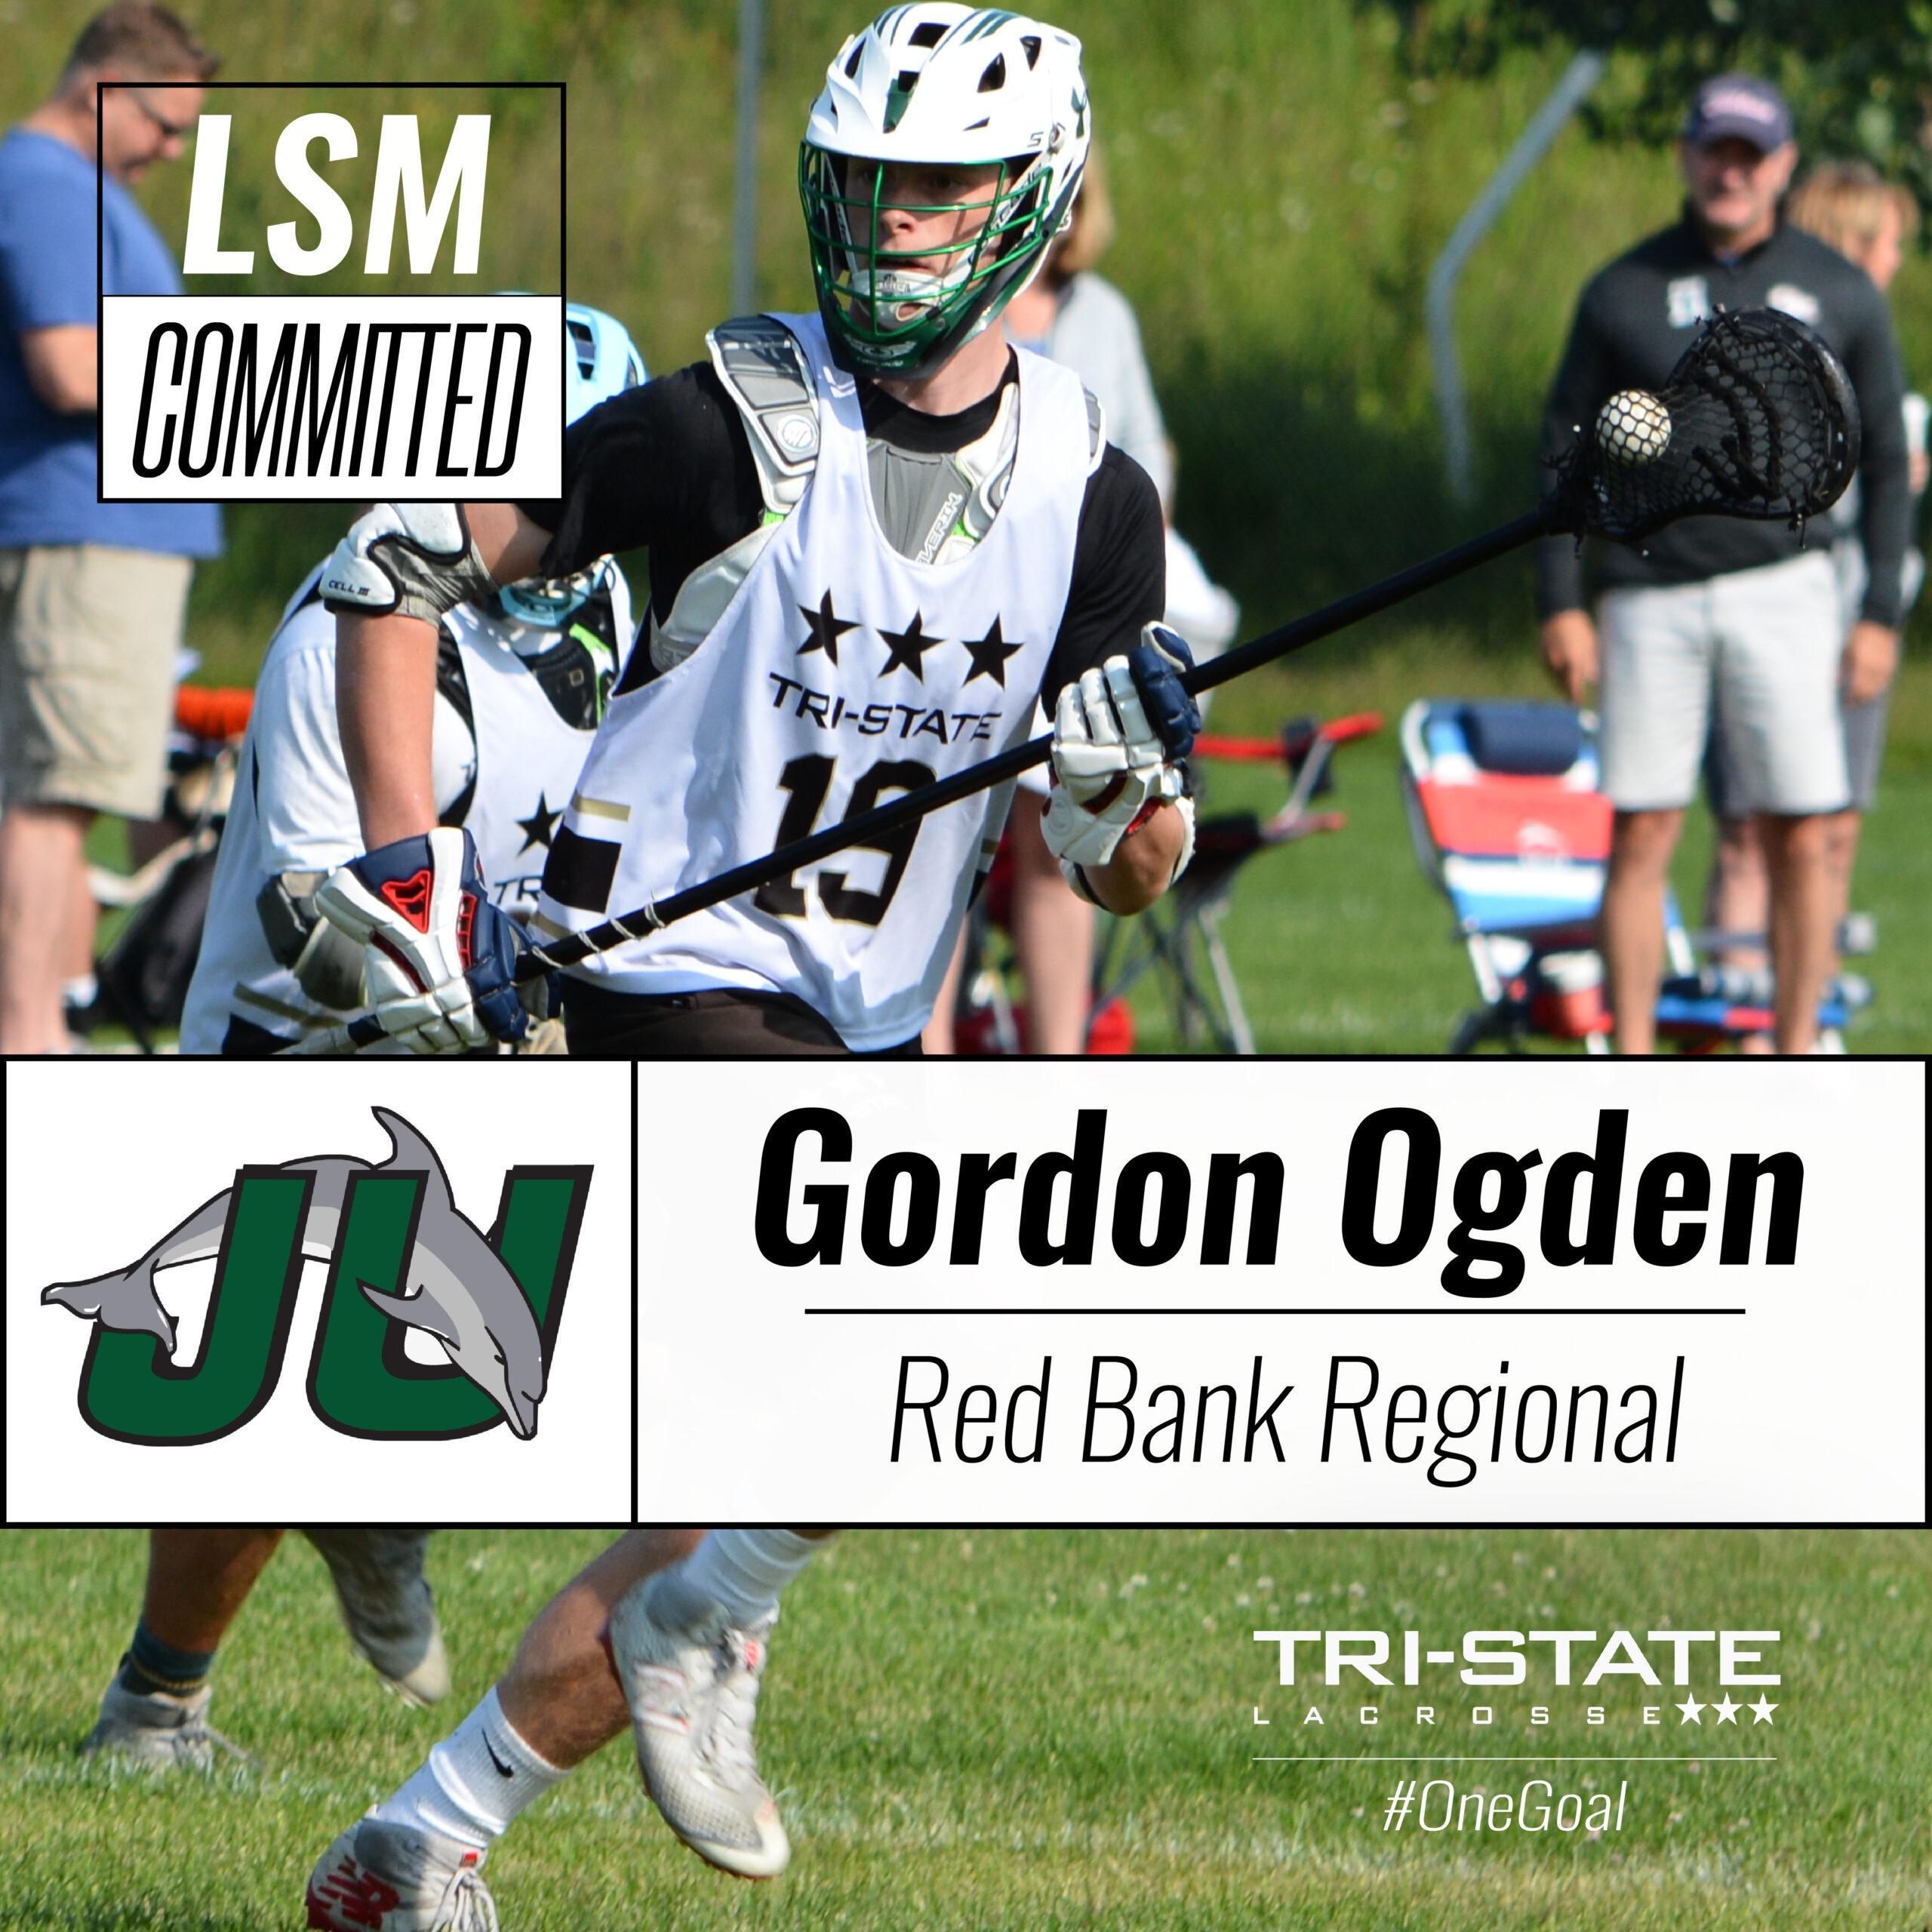 Gordon Ogden, Jacksonville Lacrosse, Red Bank Regional